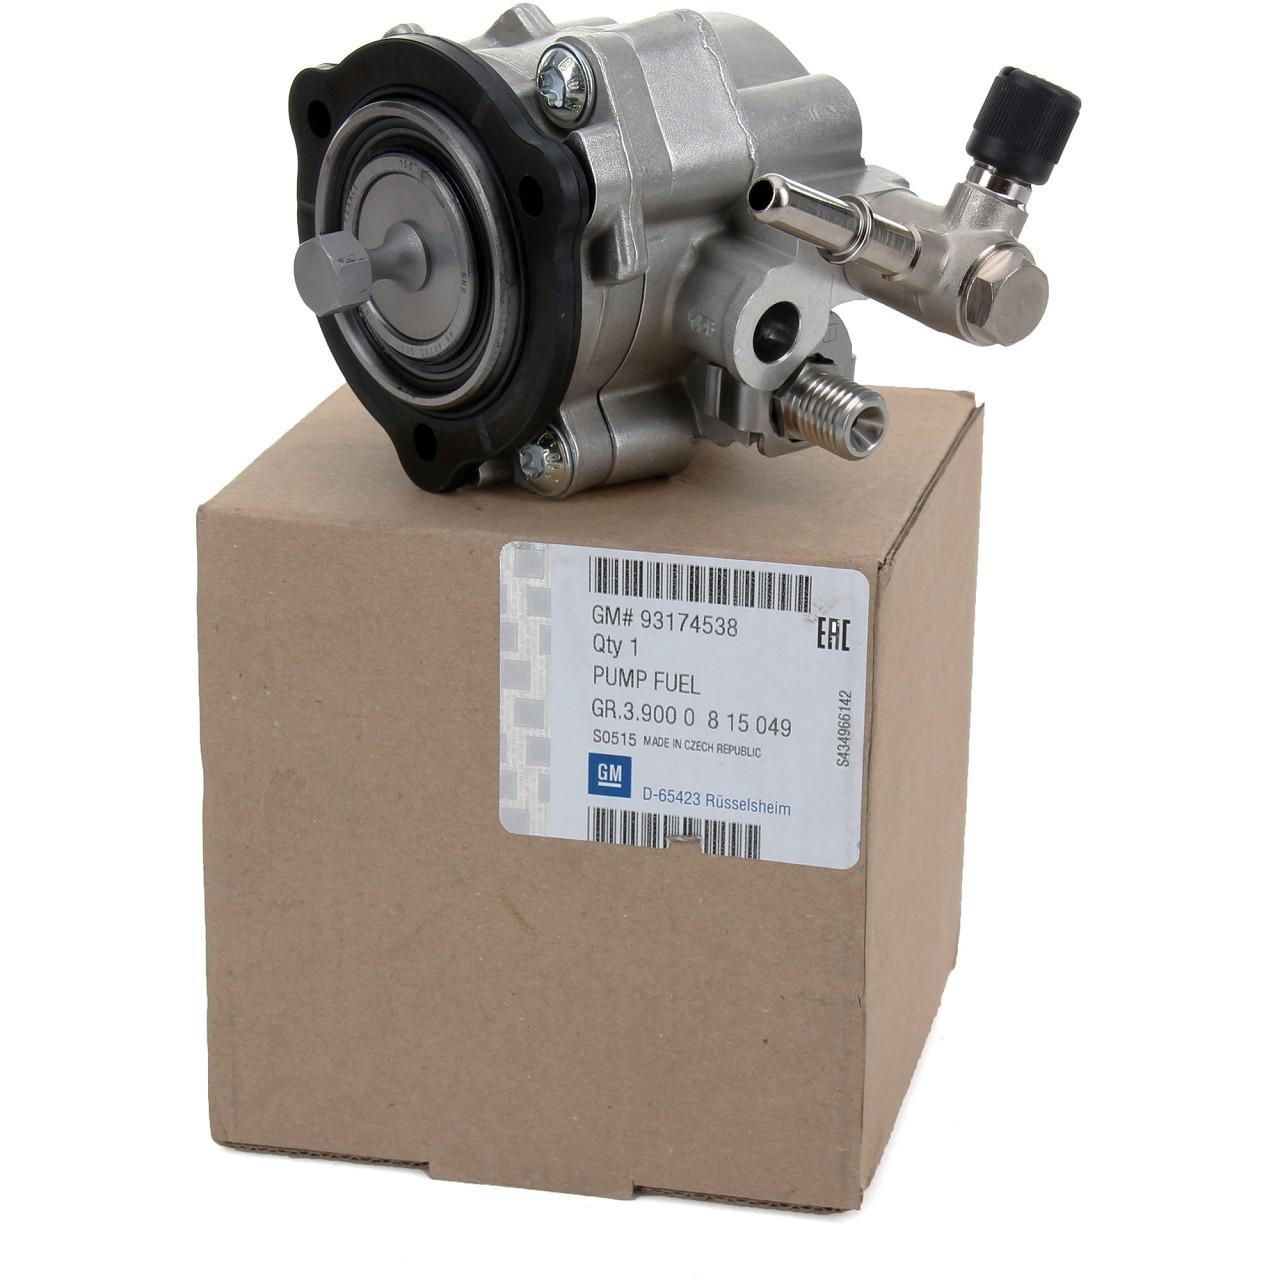 ORIGINAL GM Opel Kraftstoffpumpe Hochdruckpumpe Benzinpumpe Z22YH 93174538